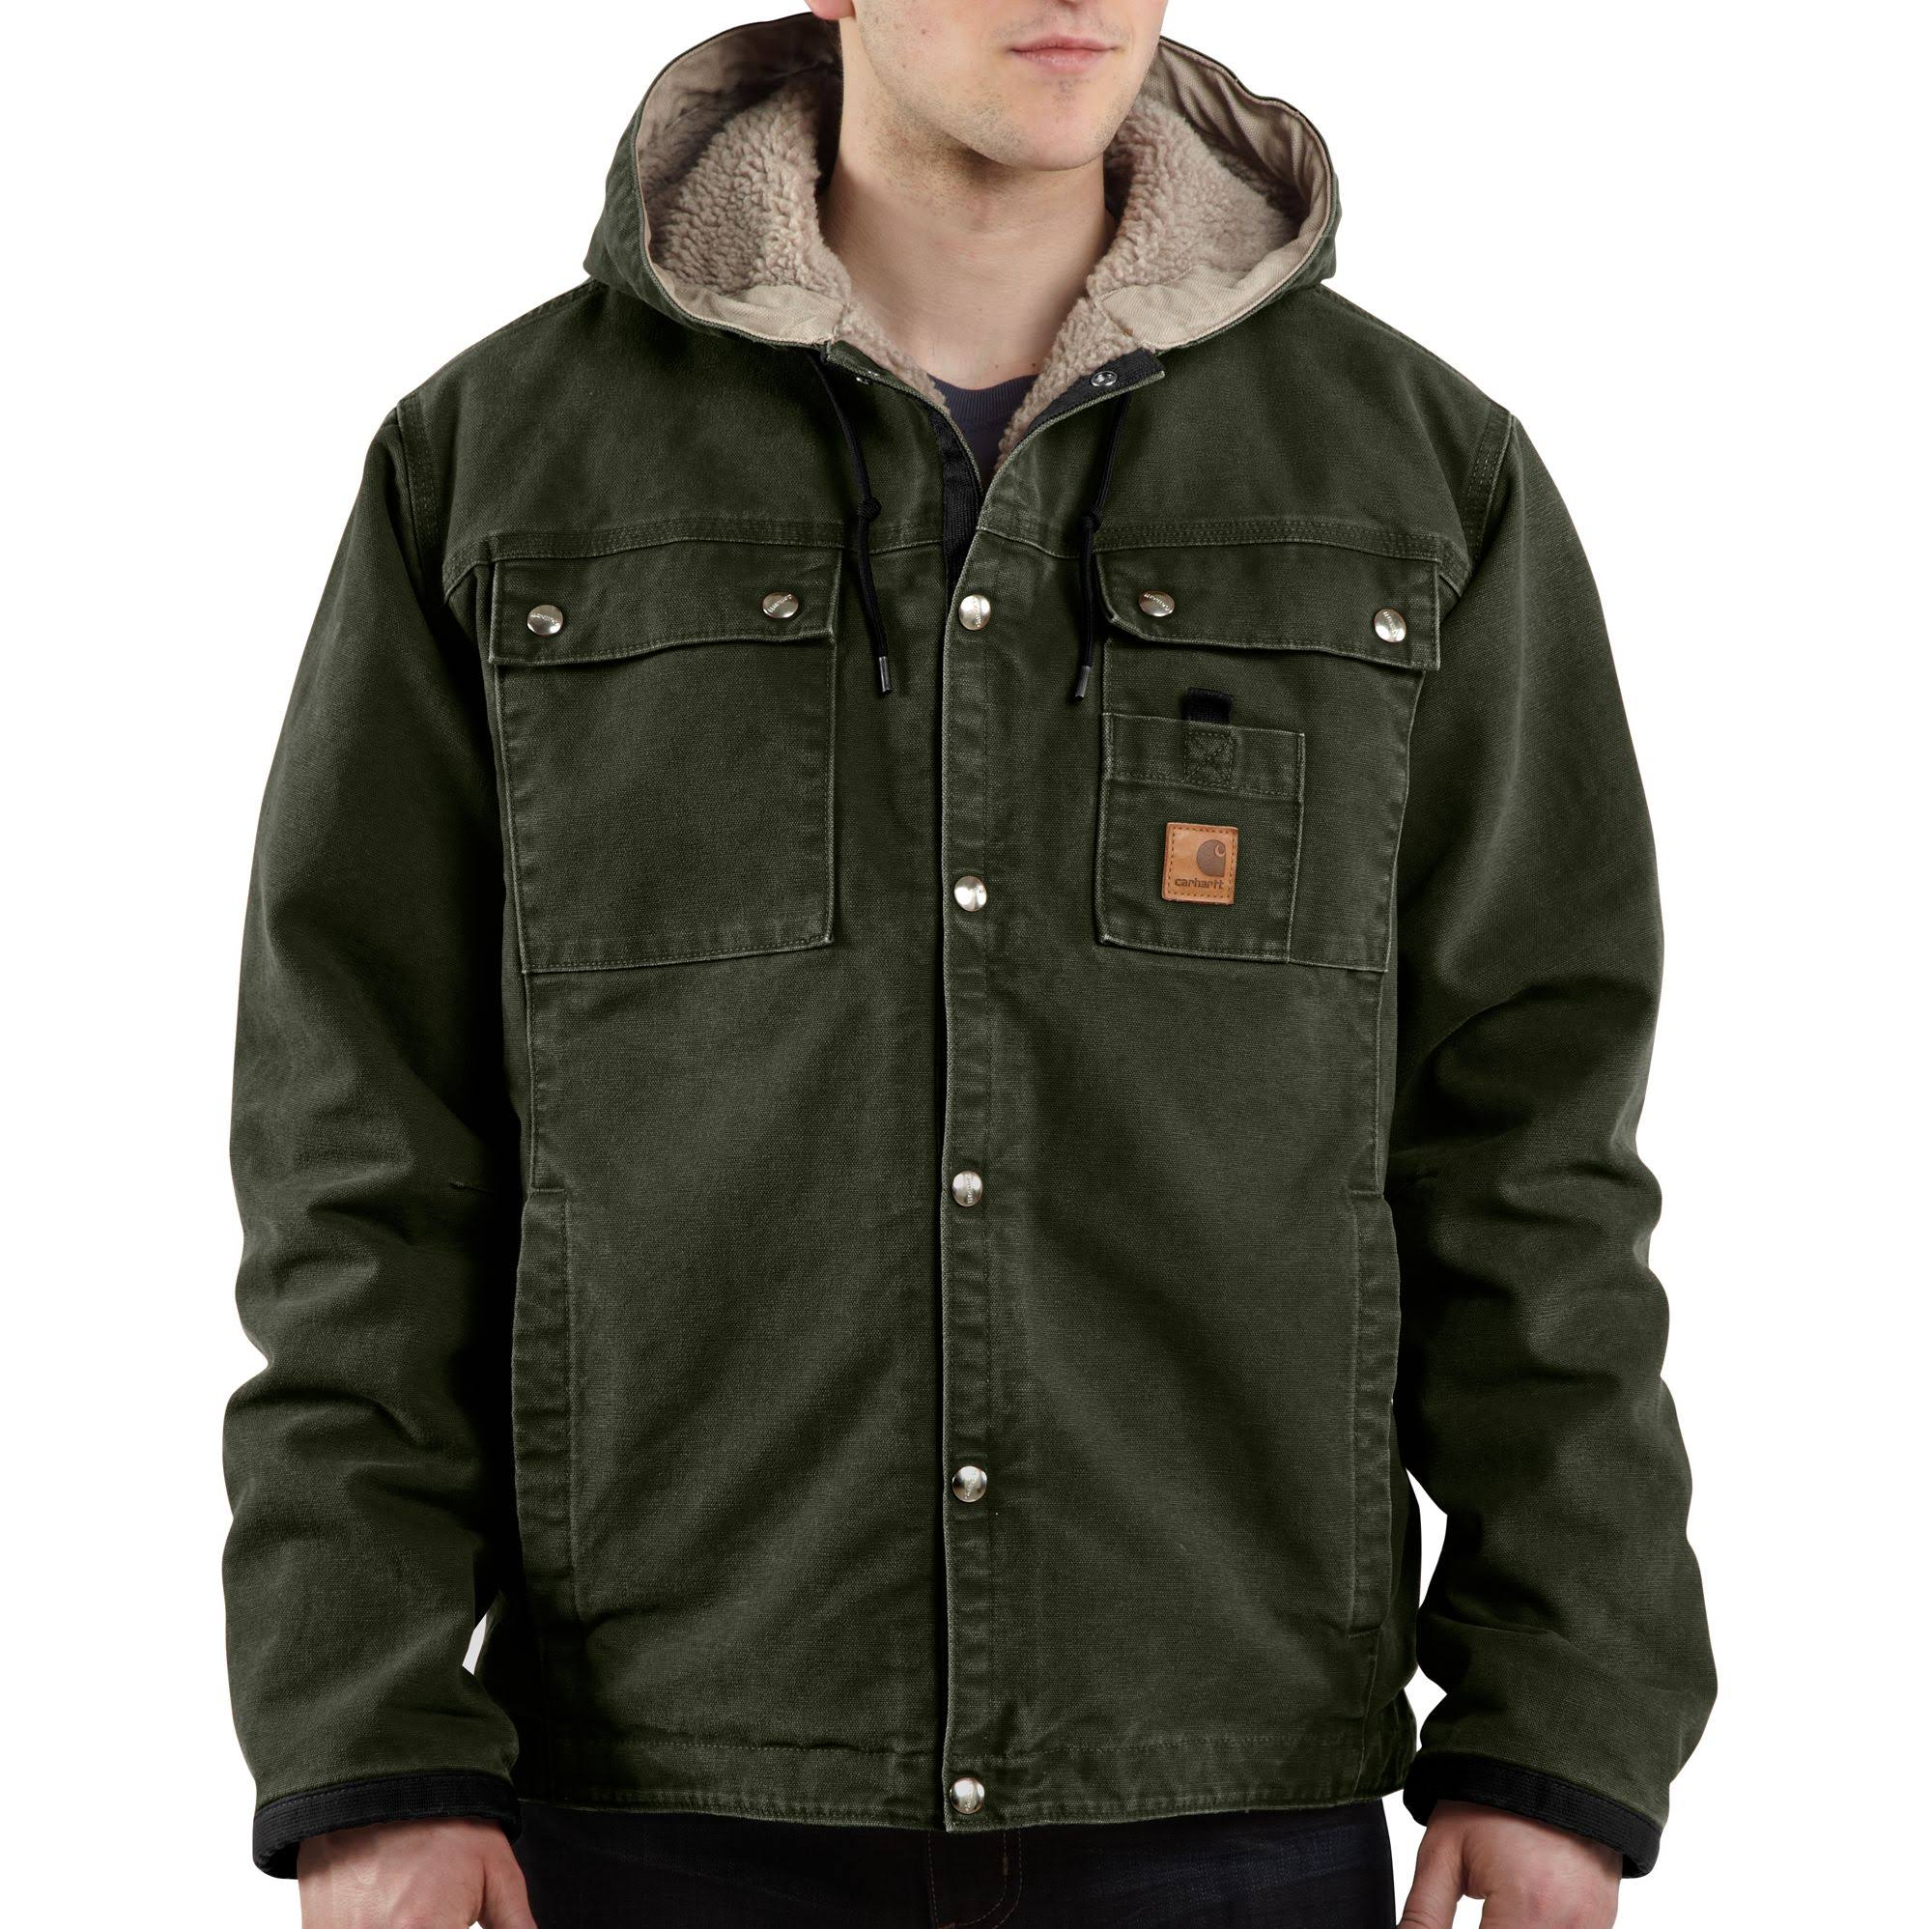 Green Carhartt Jacke Moss Regular Gefütterte Sandstone J284 Mens 4xl Sherpa gvwqa7n1Wg